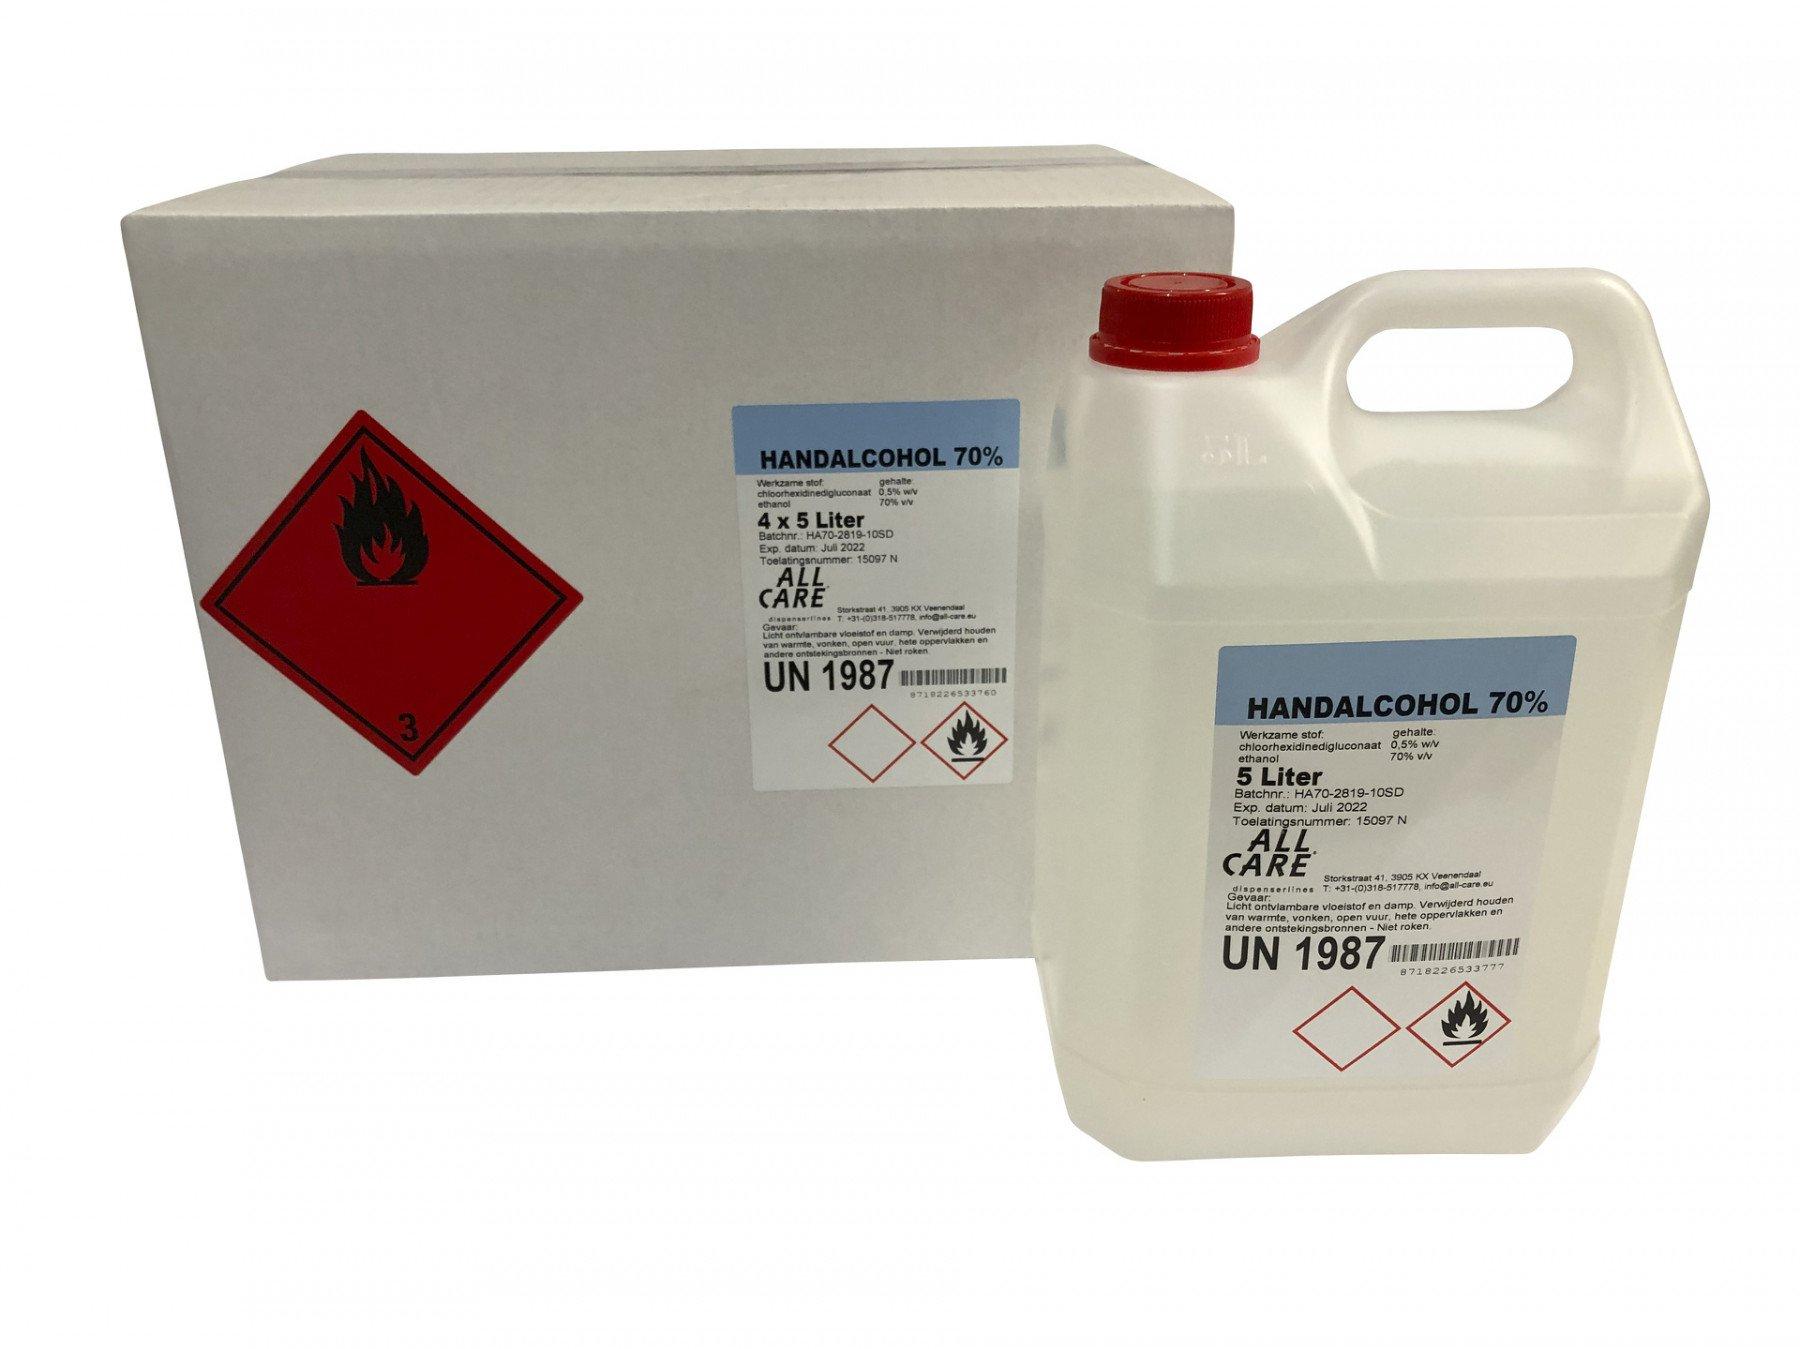 All Care | Handalcohol 70% | Gevoelige Huid | Jerrycan 5 liter